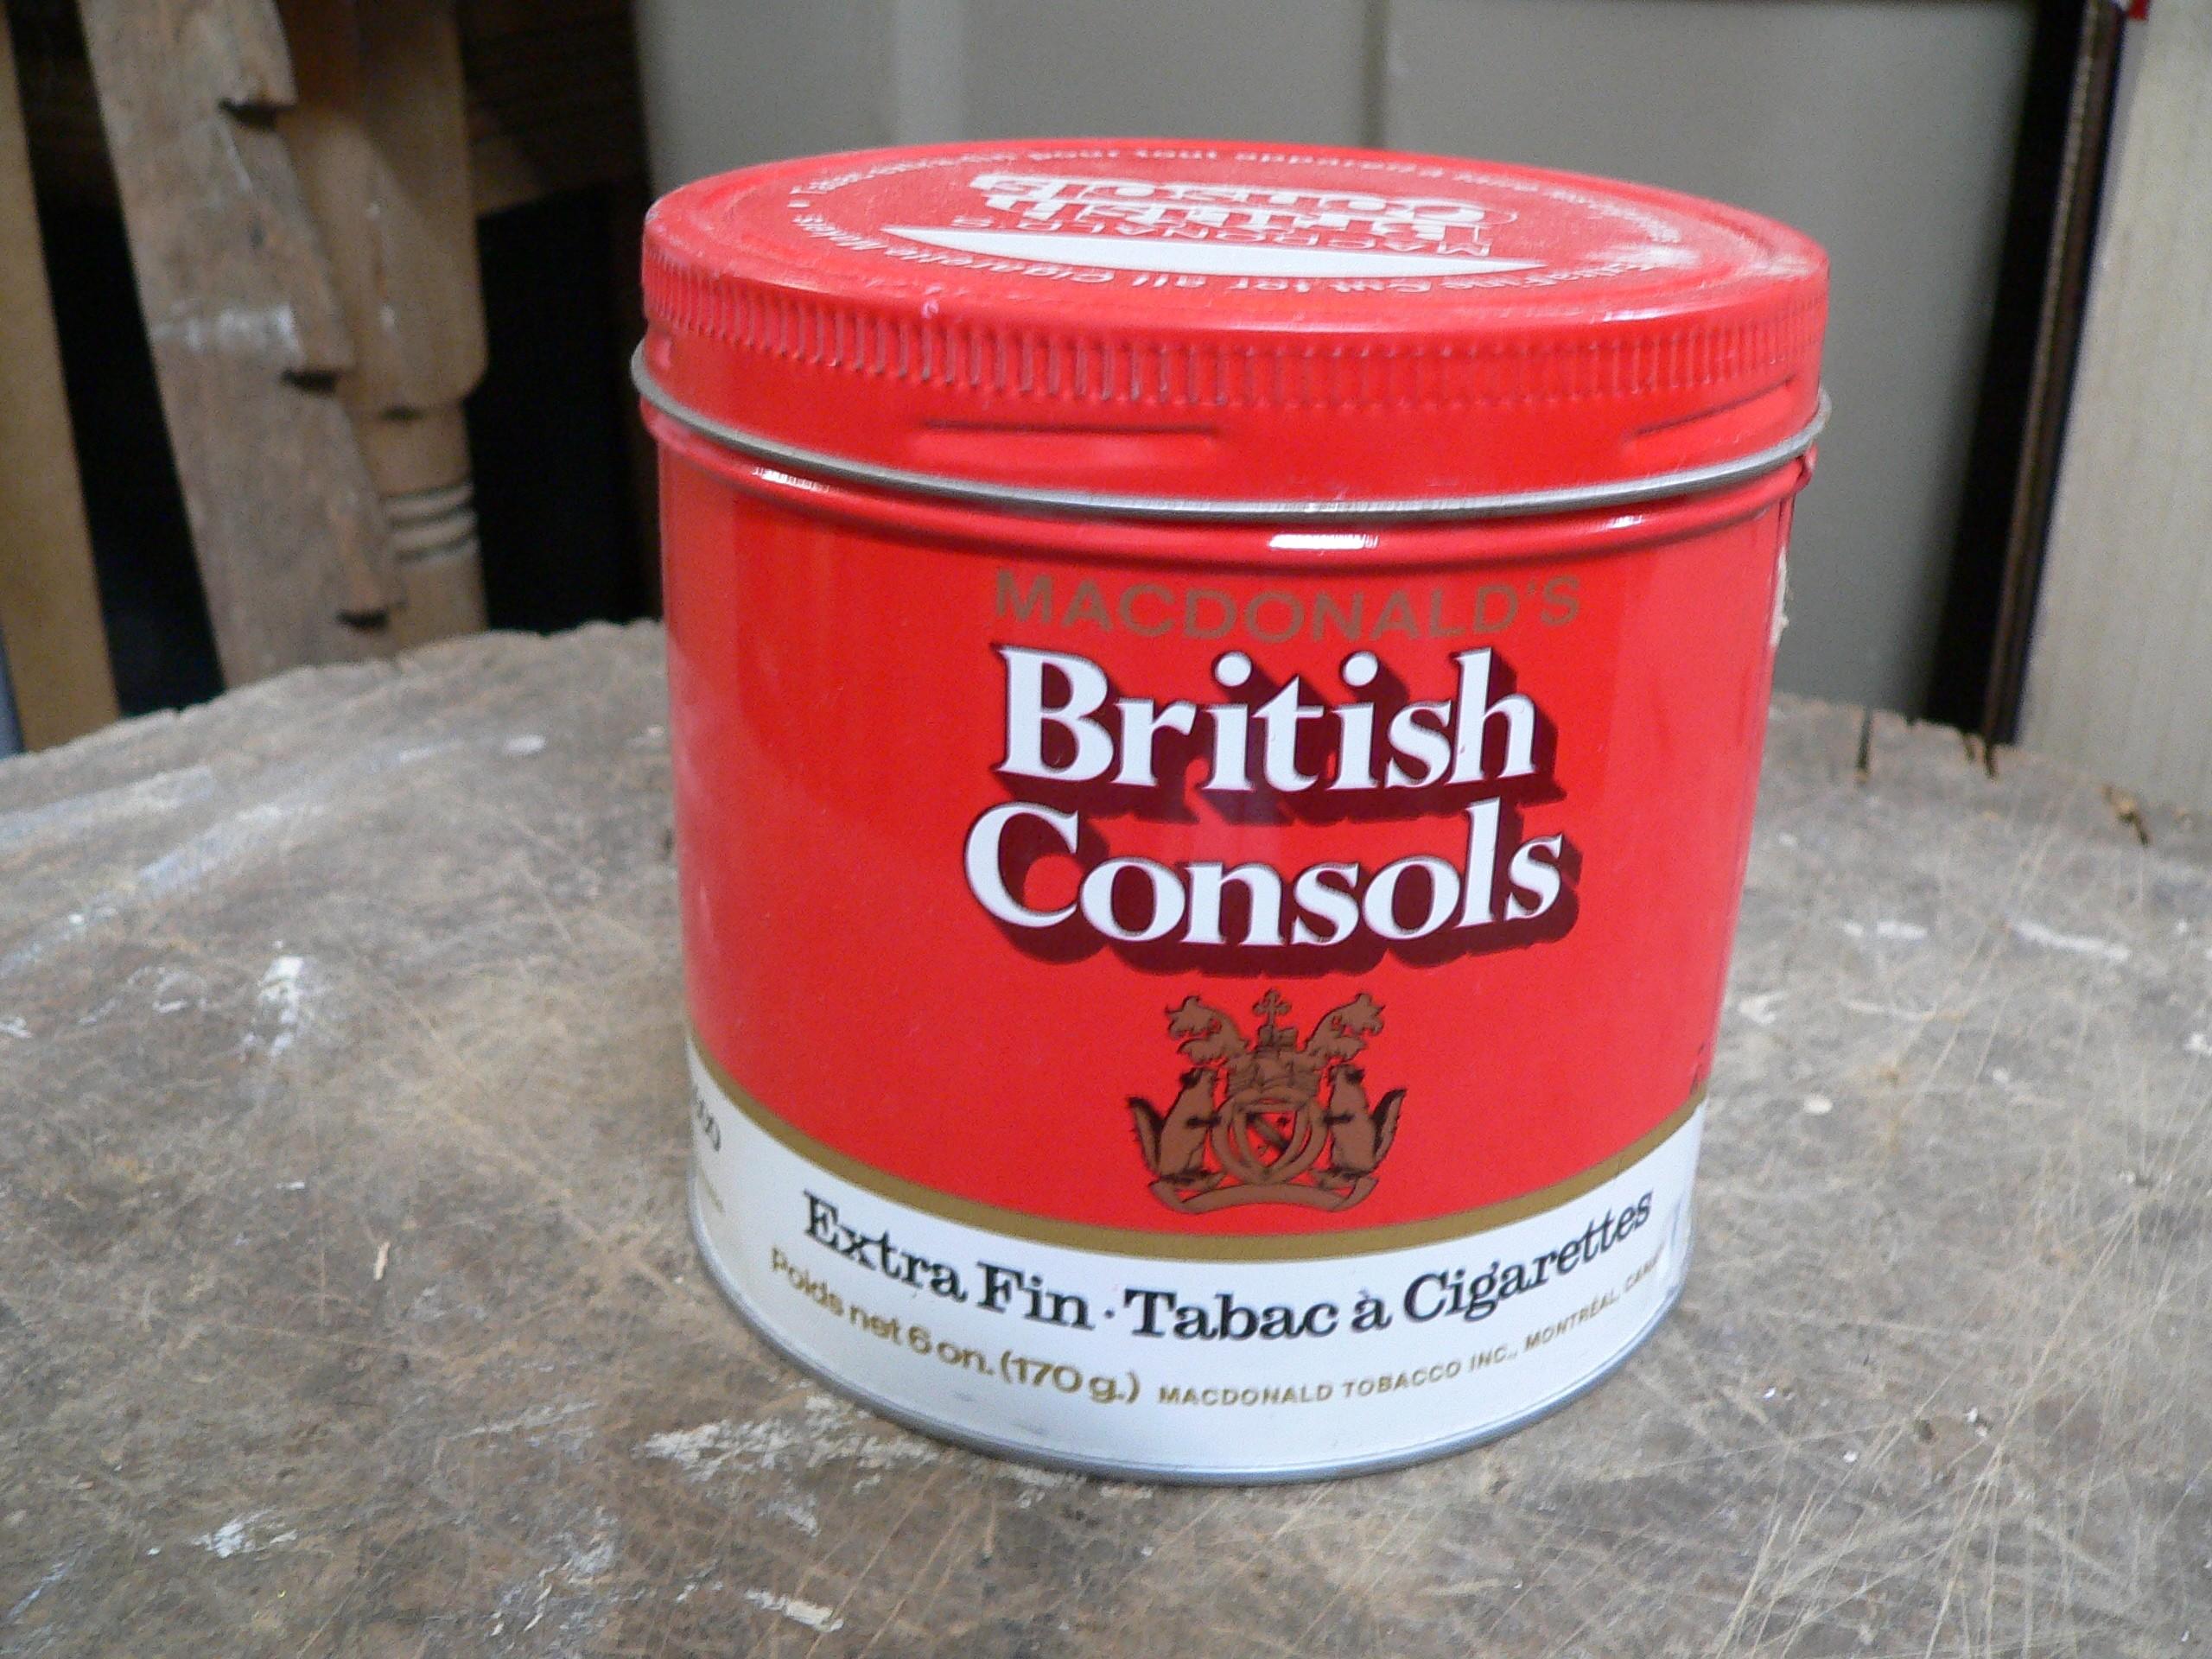 Canne de tabac british consols # 7486.6